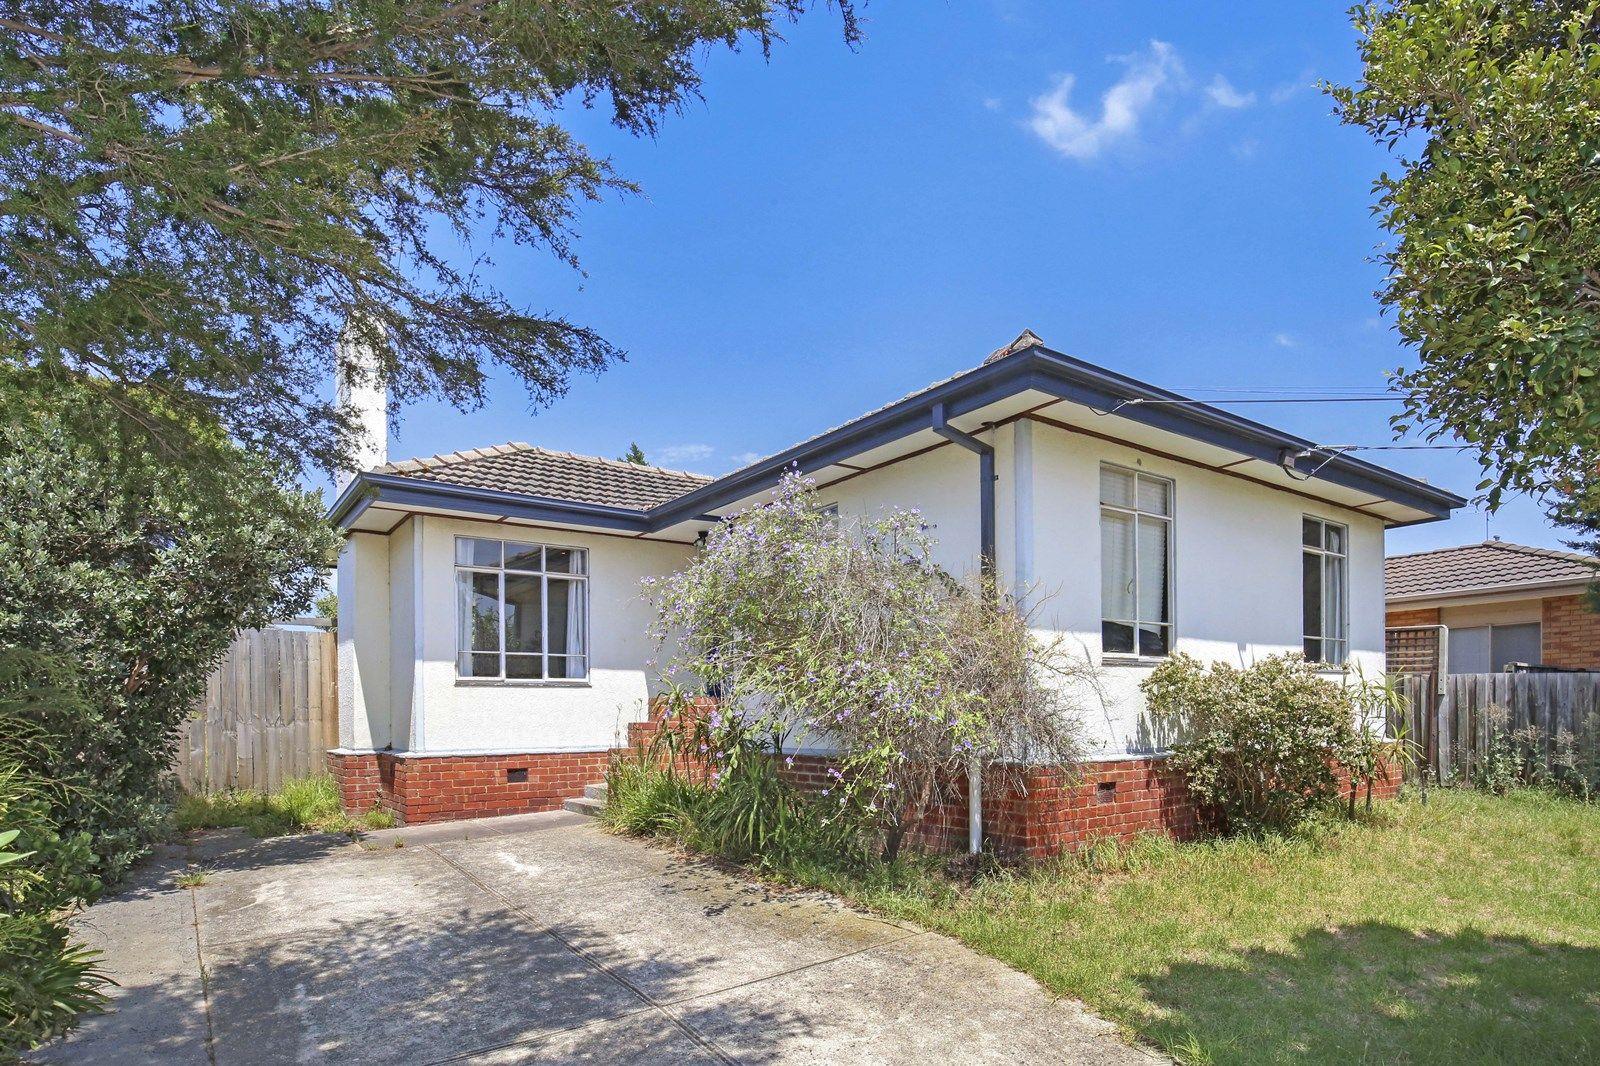 37 Drysdale Street, Reservoir VIC 3073, Image 1